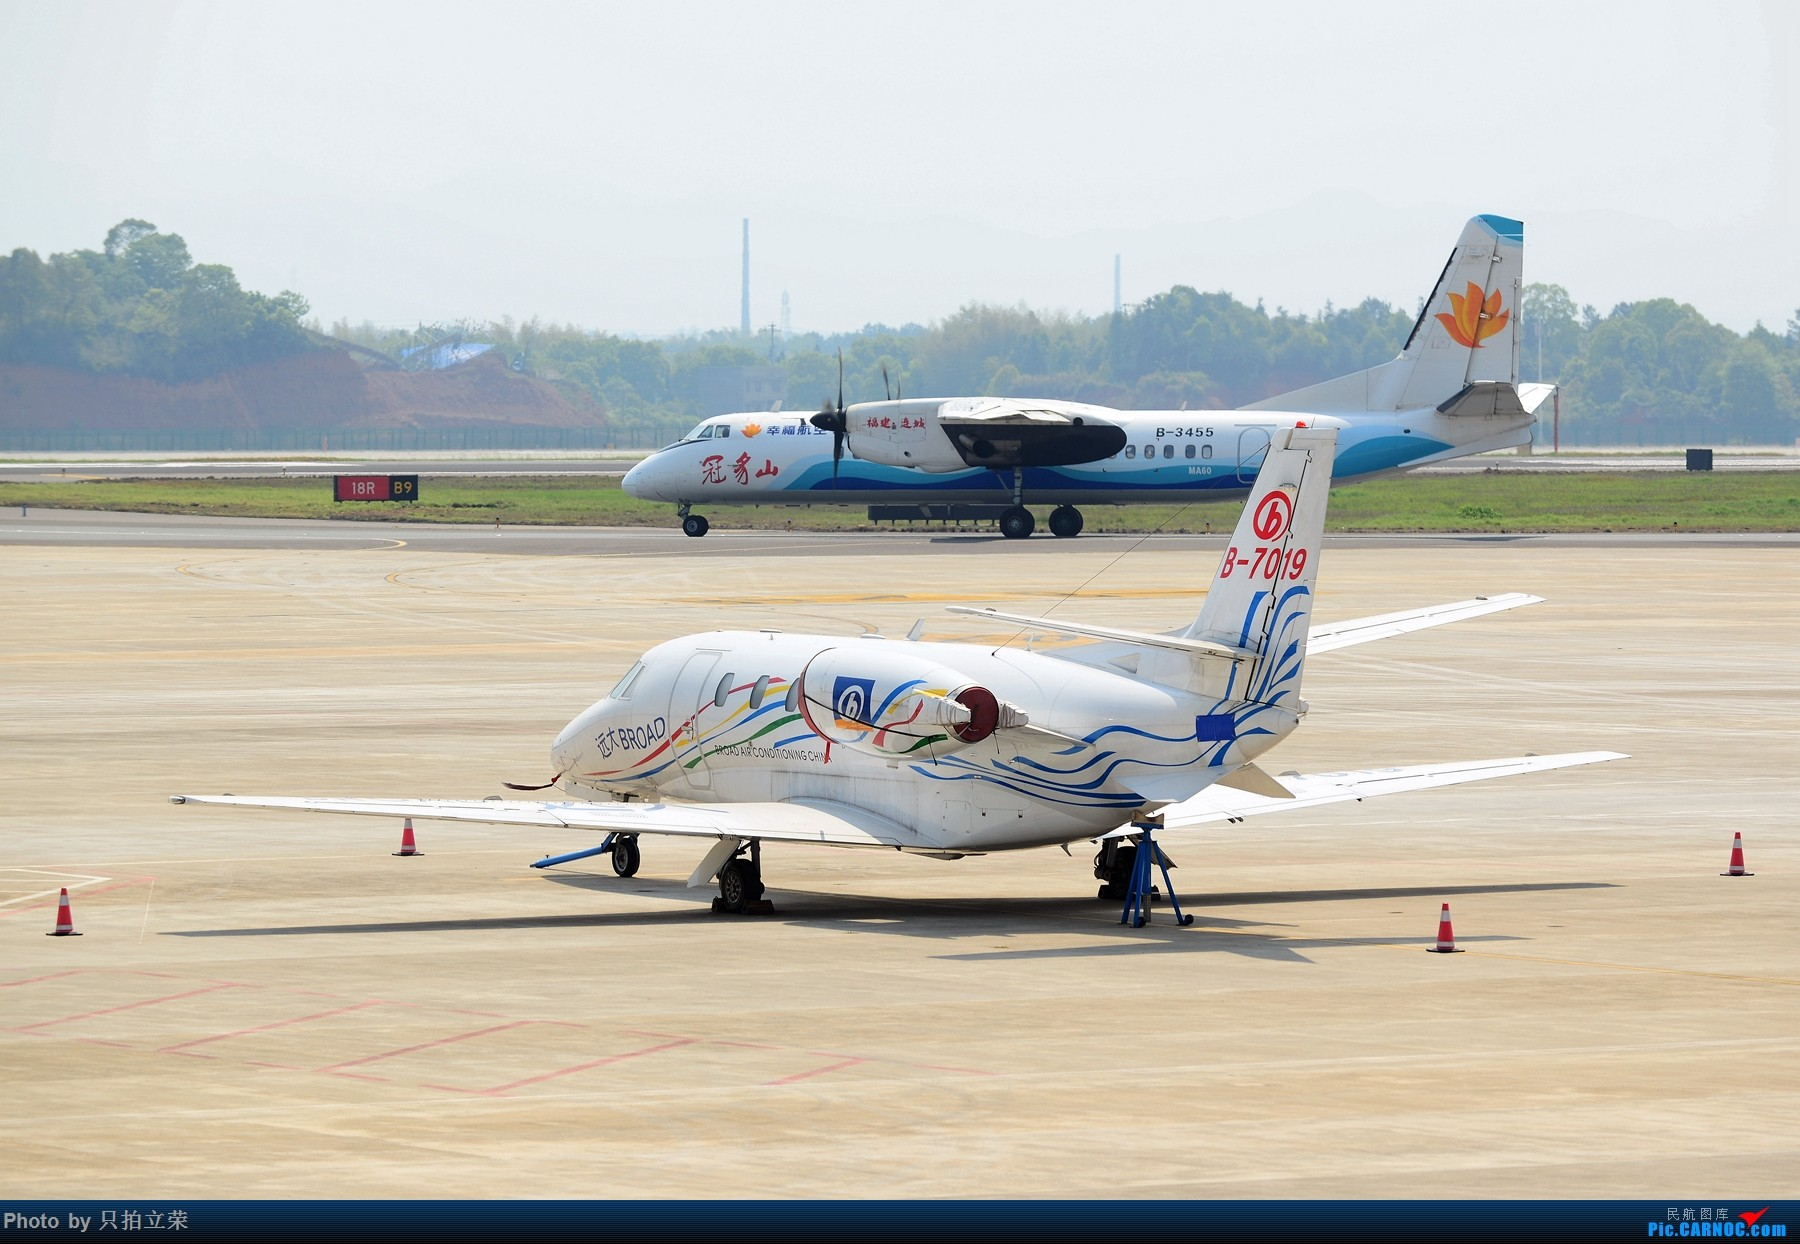 Re:[原创]湖南飞友会:黄花机场首拍飞行的青岛航空,另外还有ARJ和远大奖状哦 CESSNA 560 B-7019 中国长沙黄花国际机场